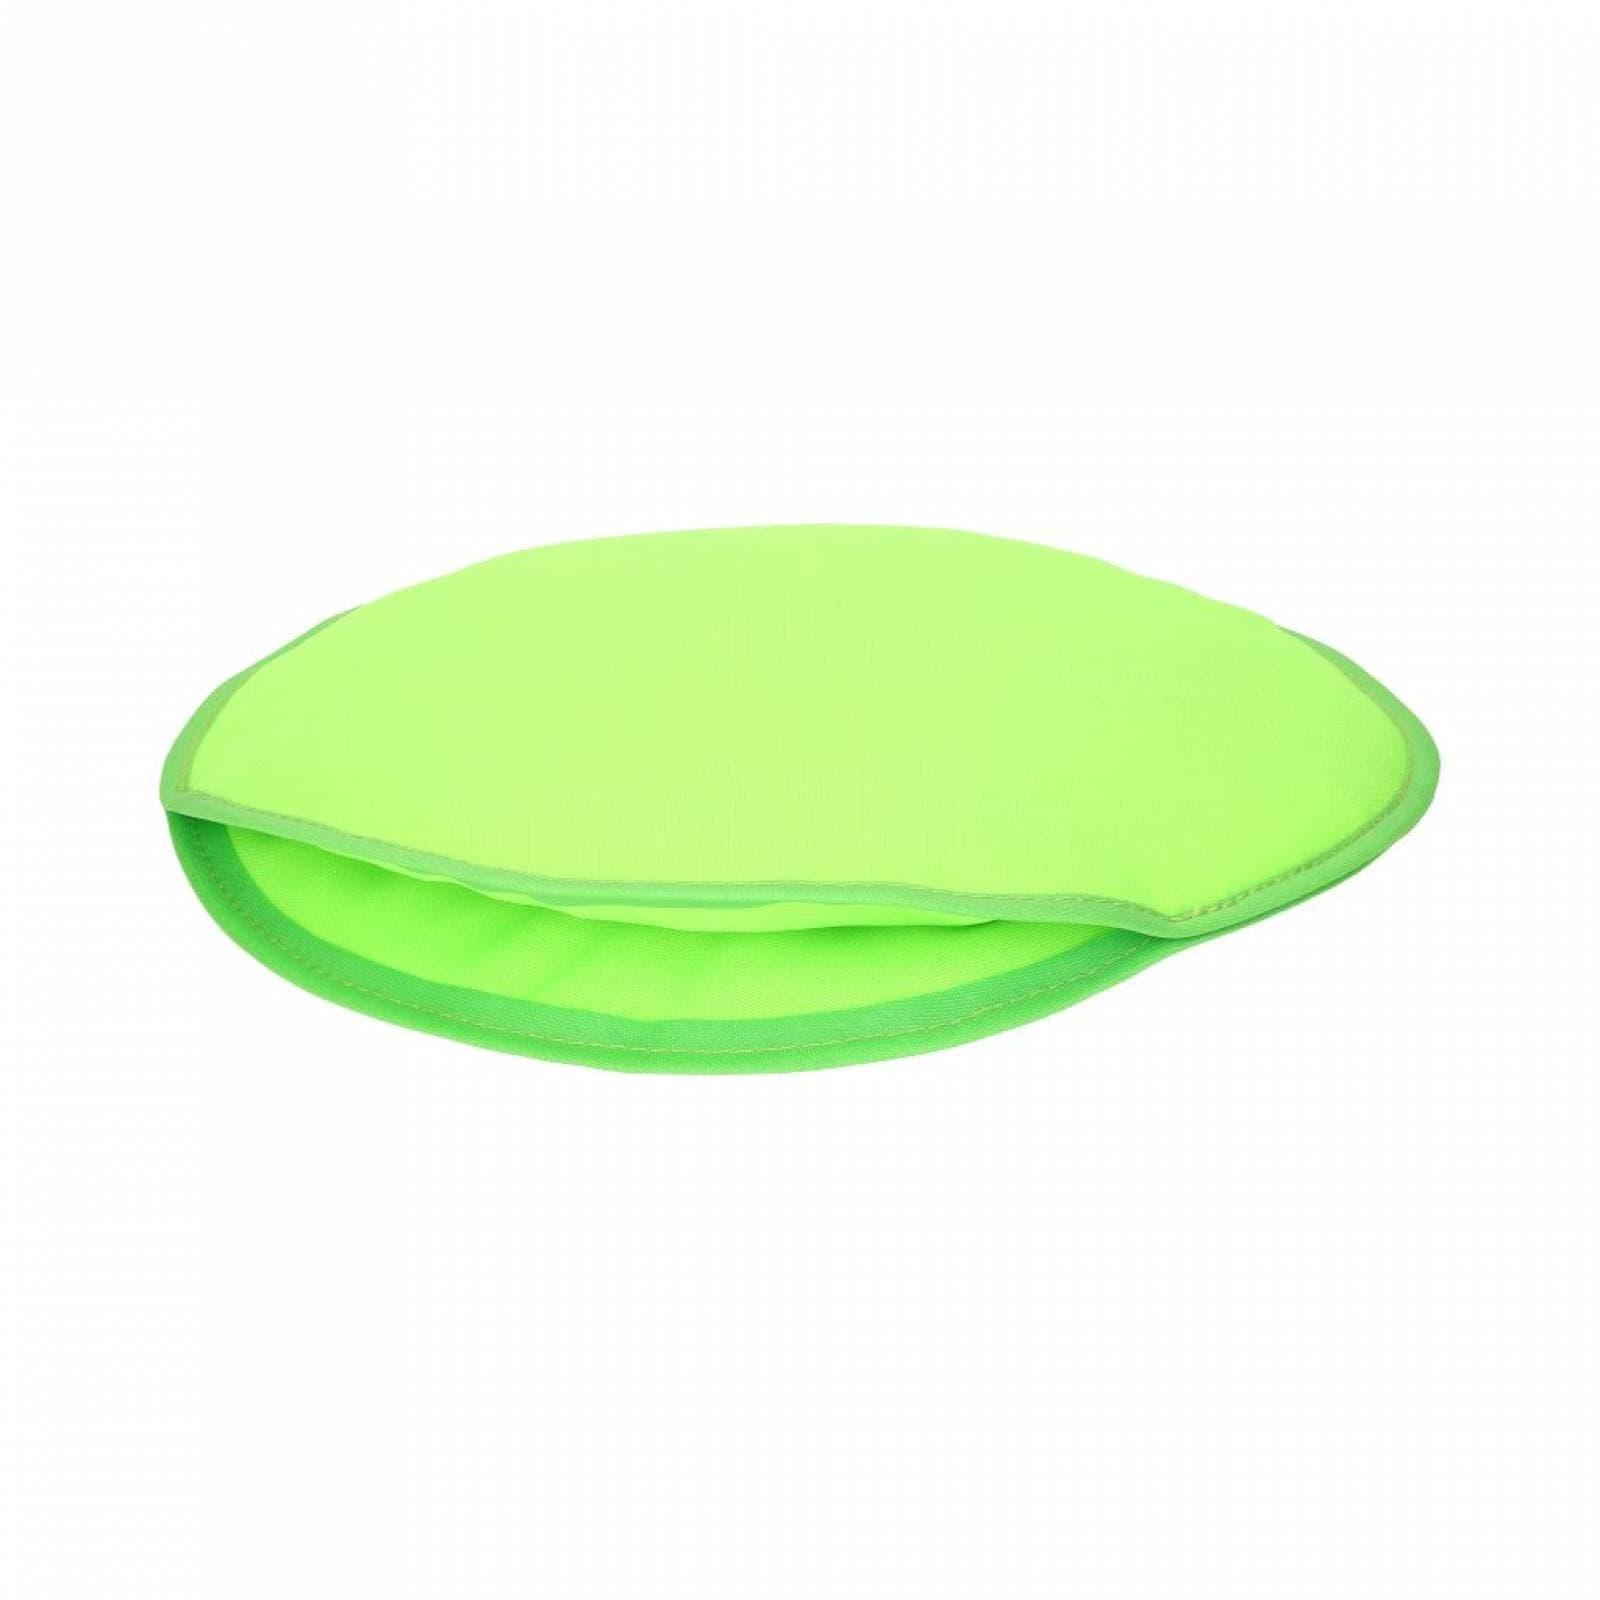 Tortillero Térmico Tela Mi Comal Verde Liso